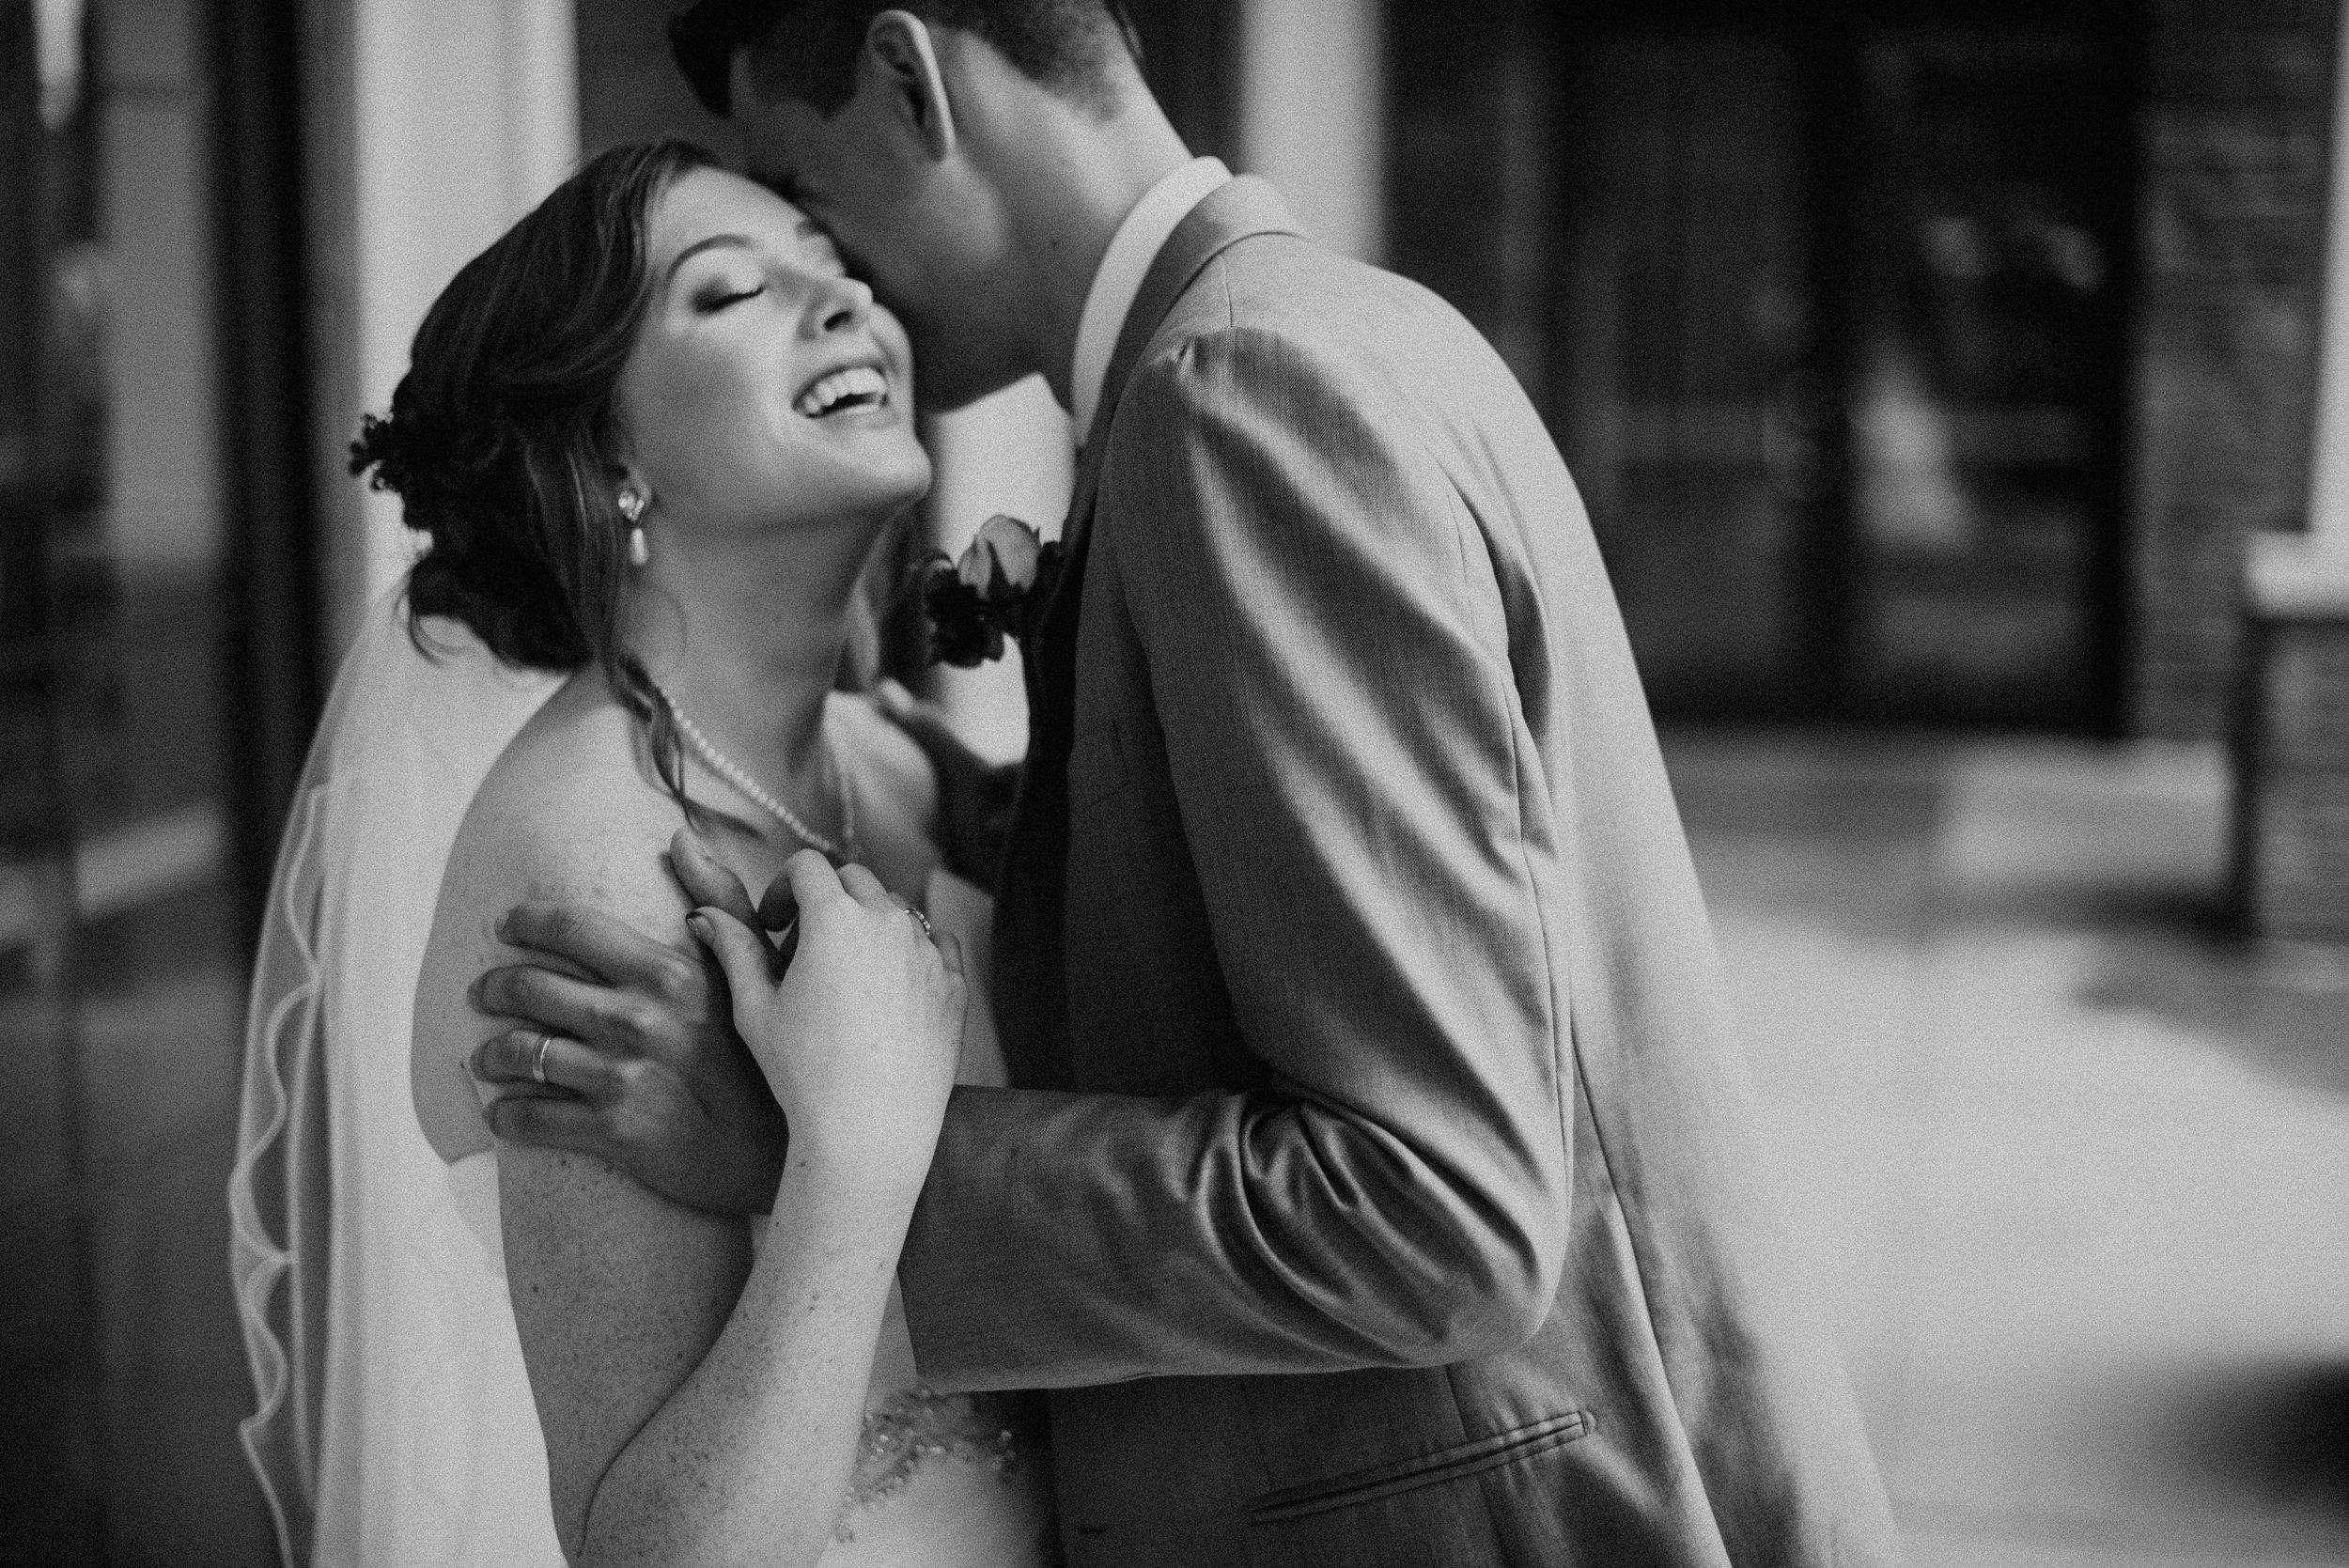 Groom whispering into bride's ear